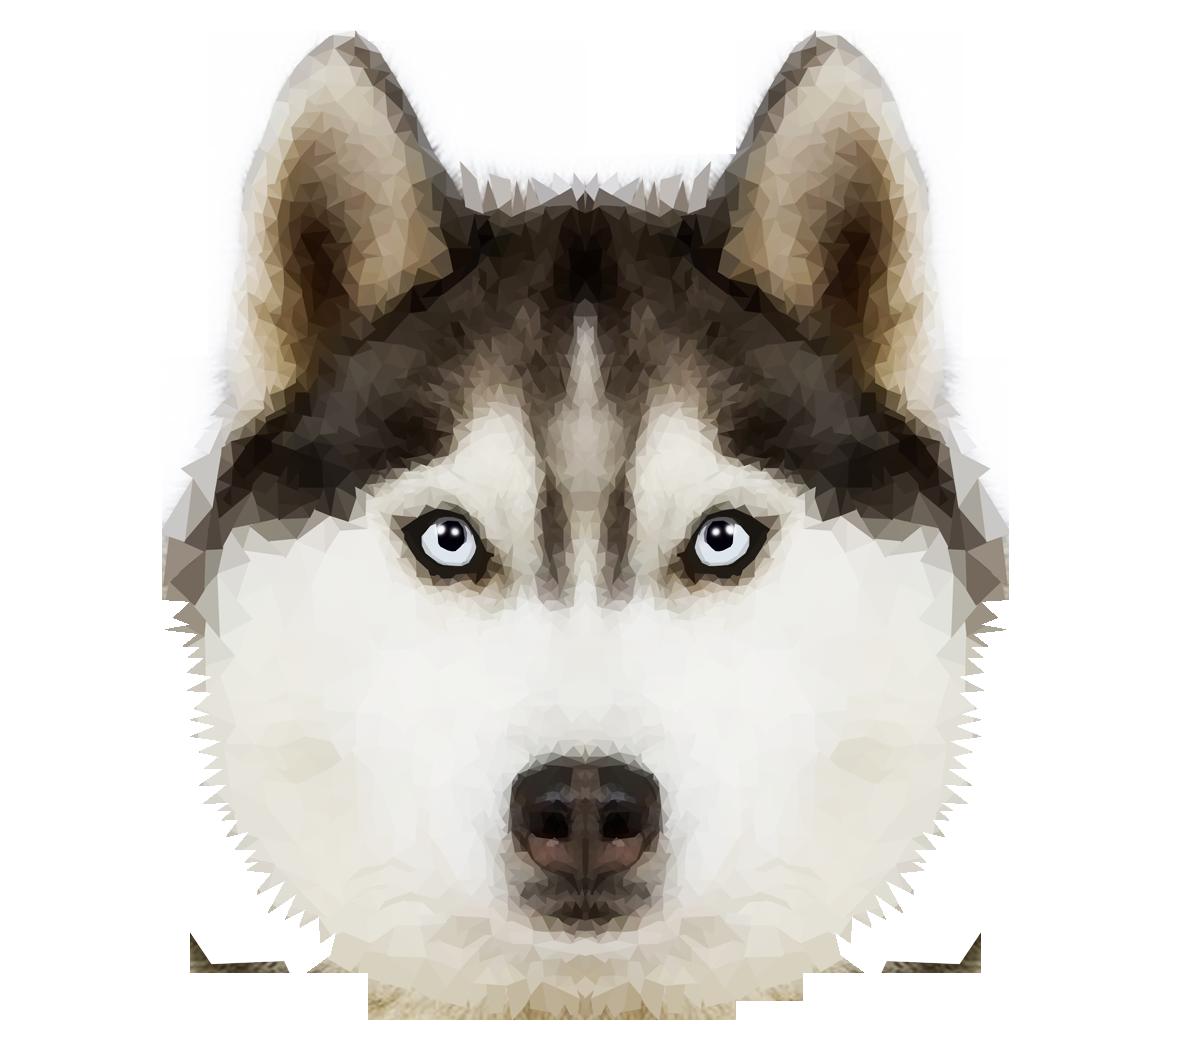 Png transparent images pluspng. Husky clipart head silhouette